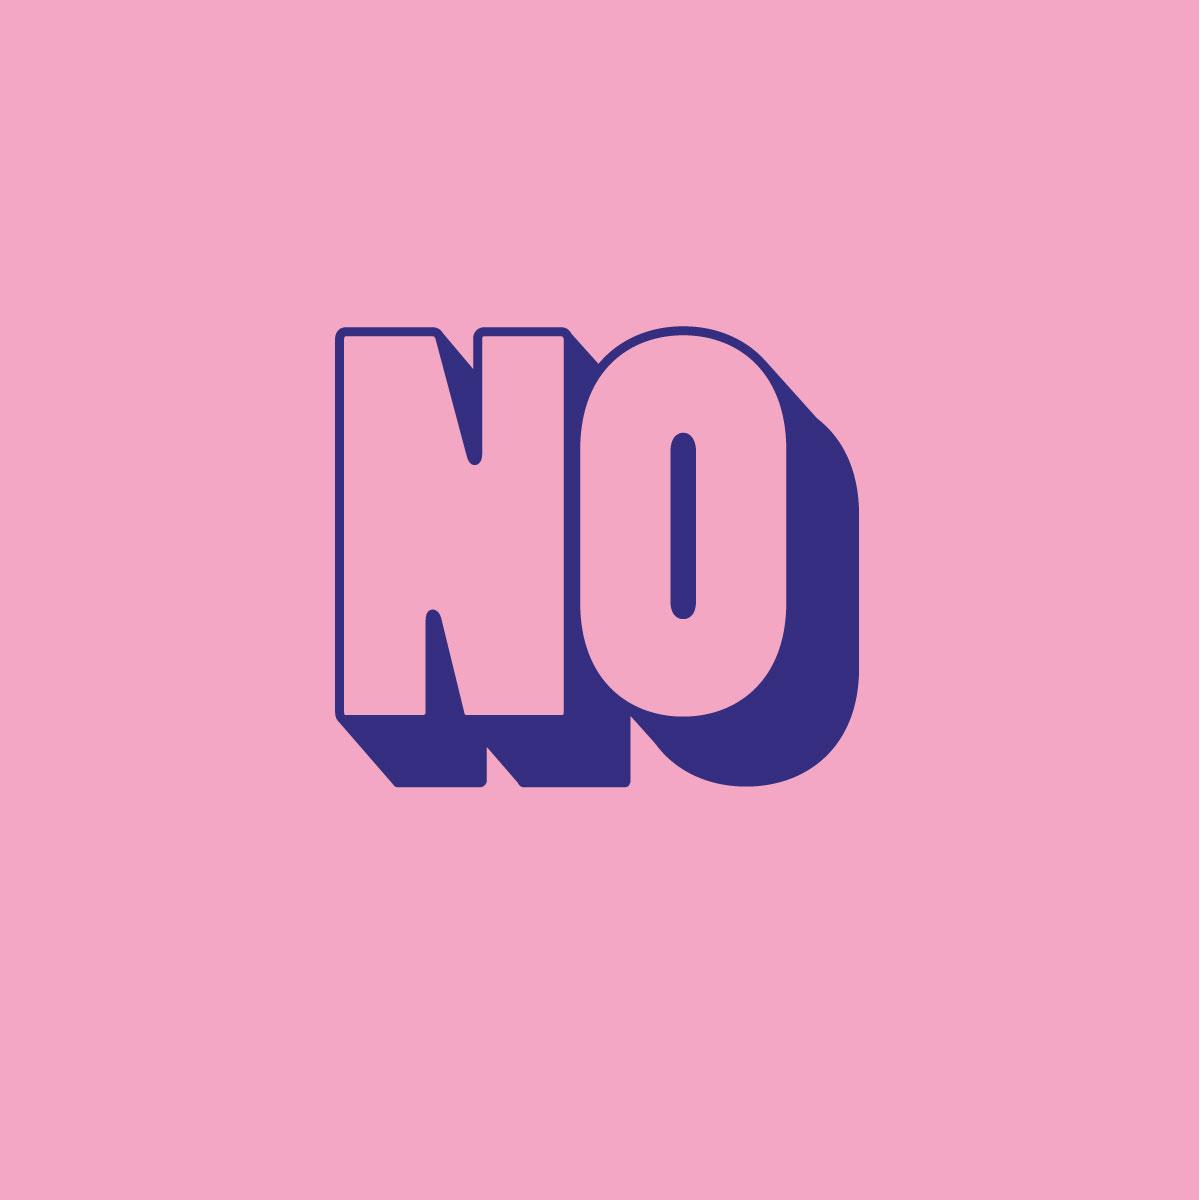 002-NO.jpg